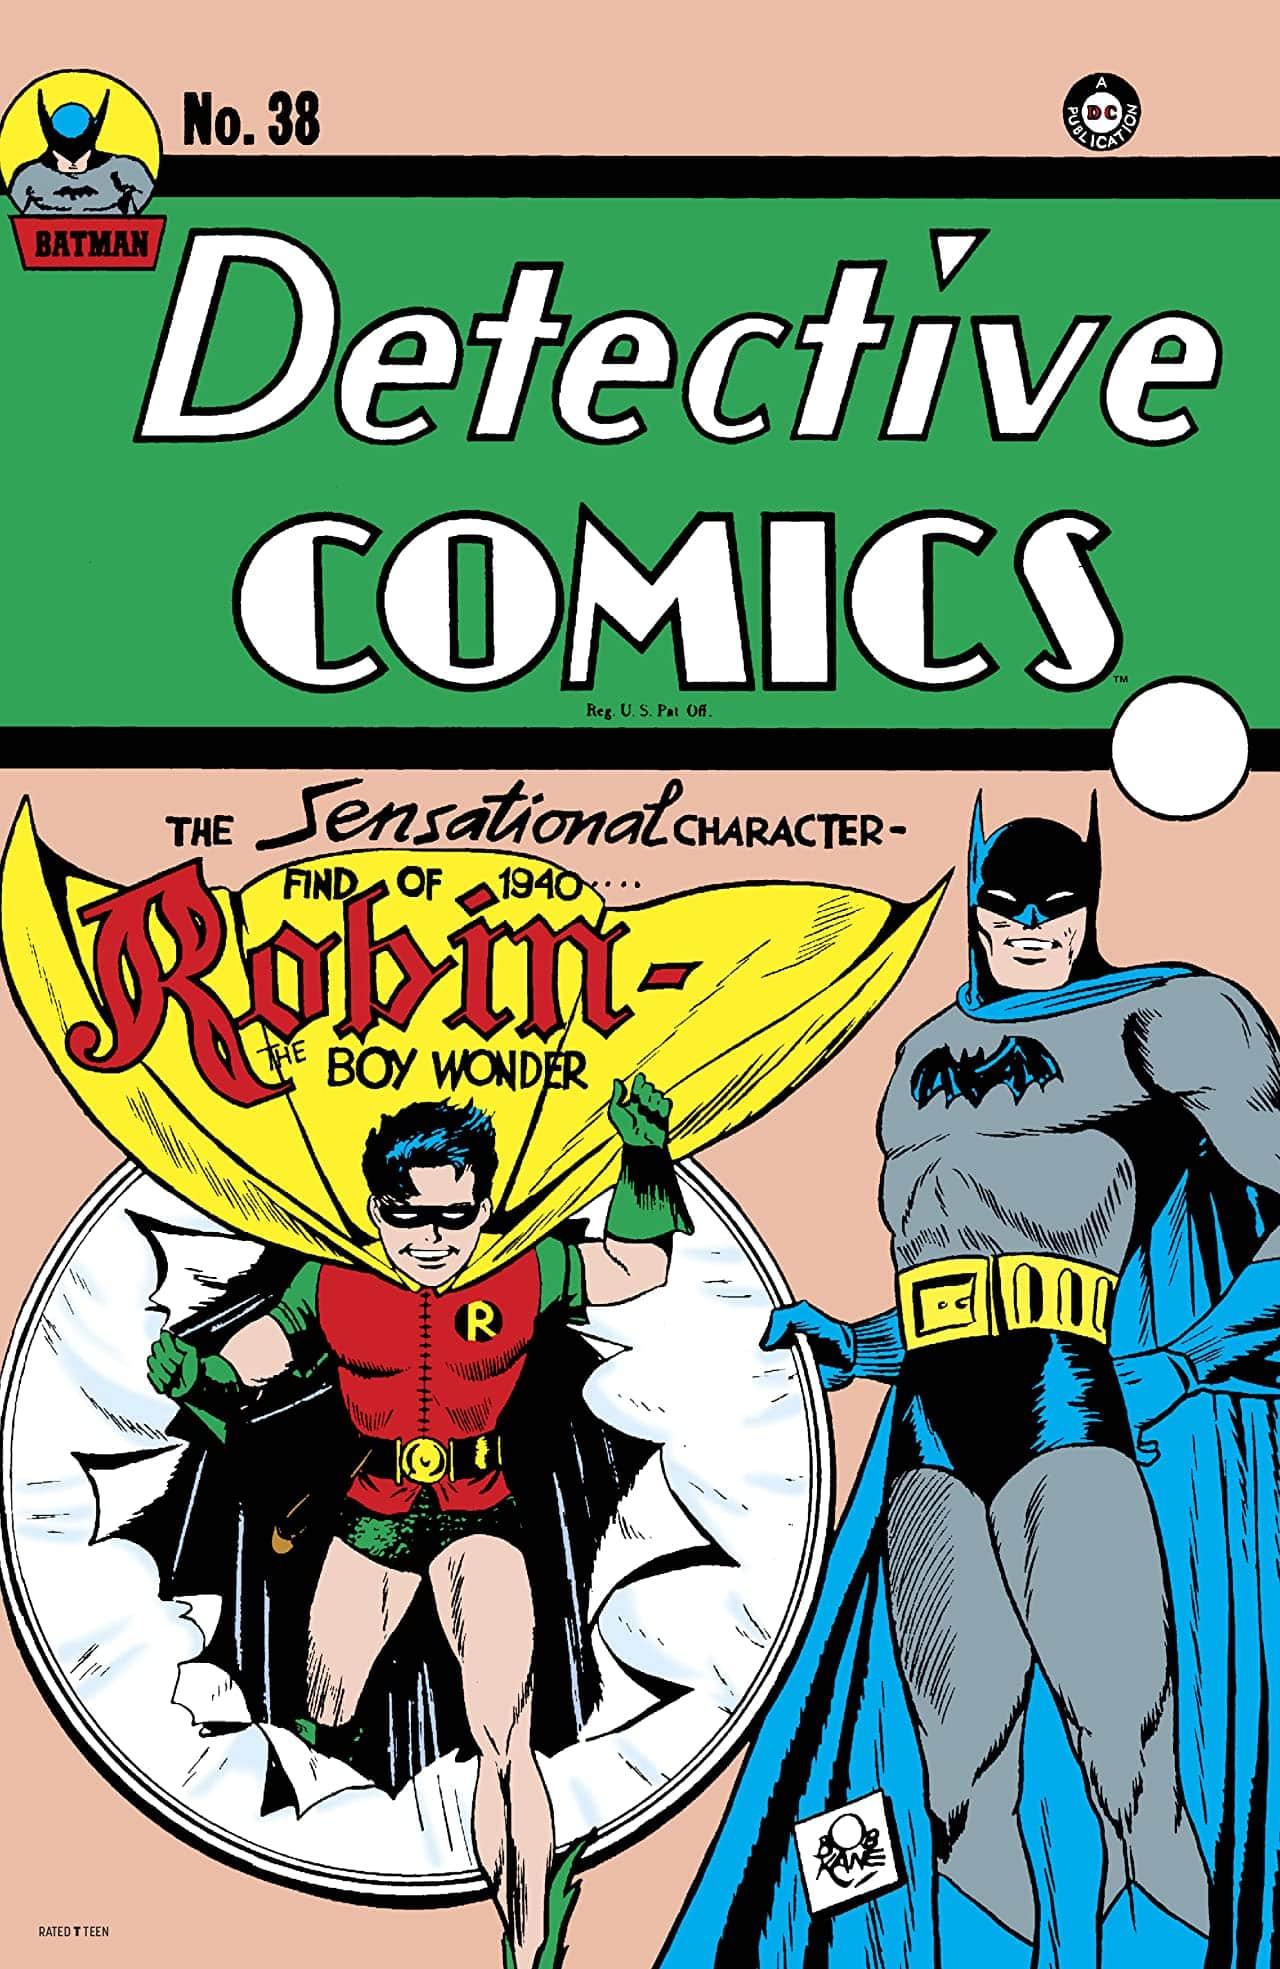 Detective Comics #38 Facsimile Edition